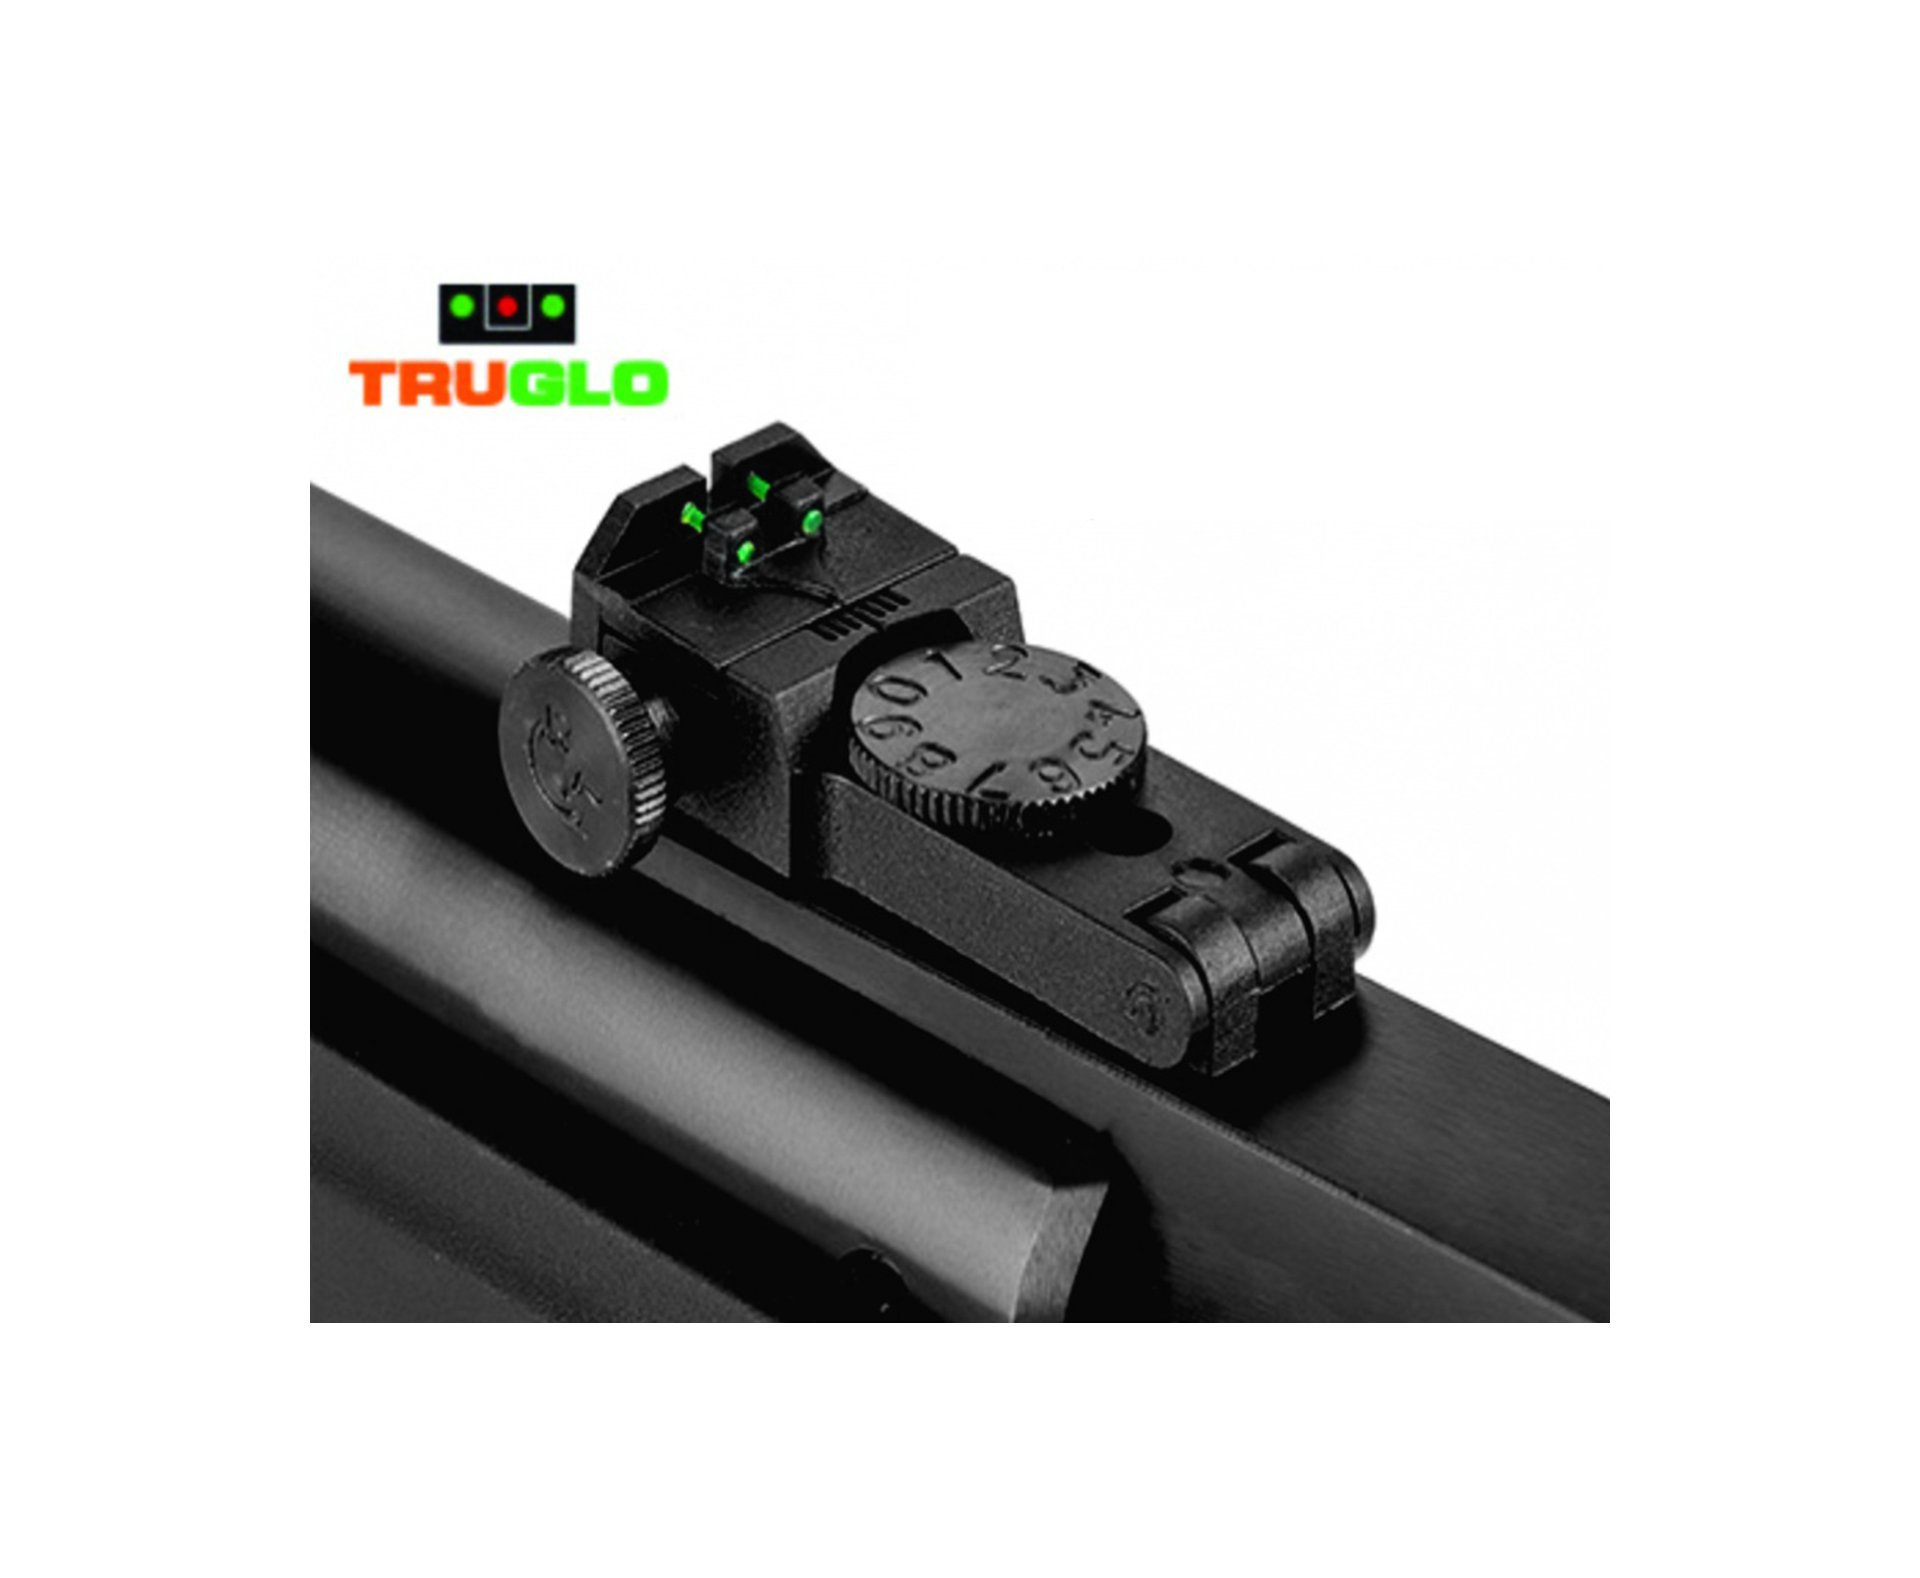 Carabina De Pressão Hatsan Ht 125 Sniper Vortex Gas Ram 75kg Cal 5,5 Mm - Sistema Sas